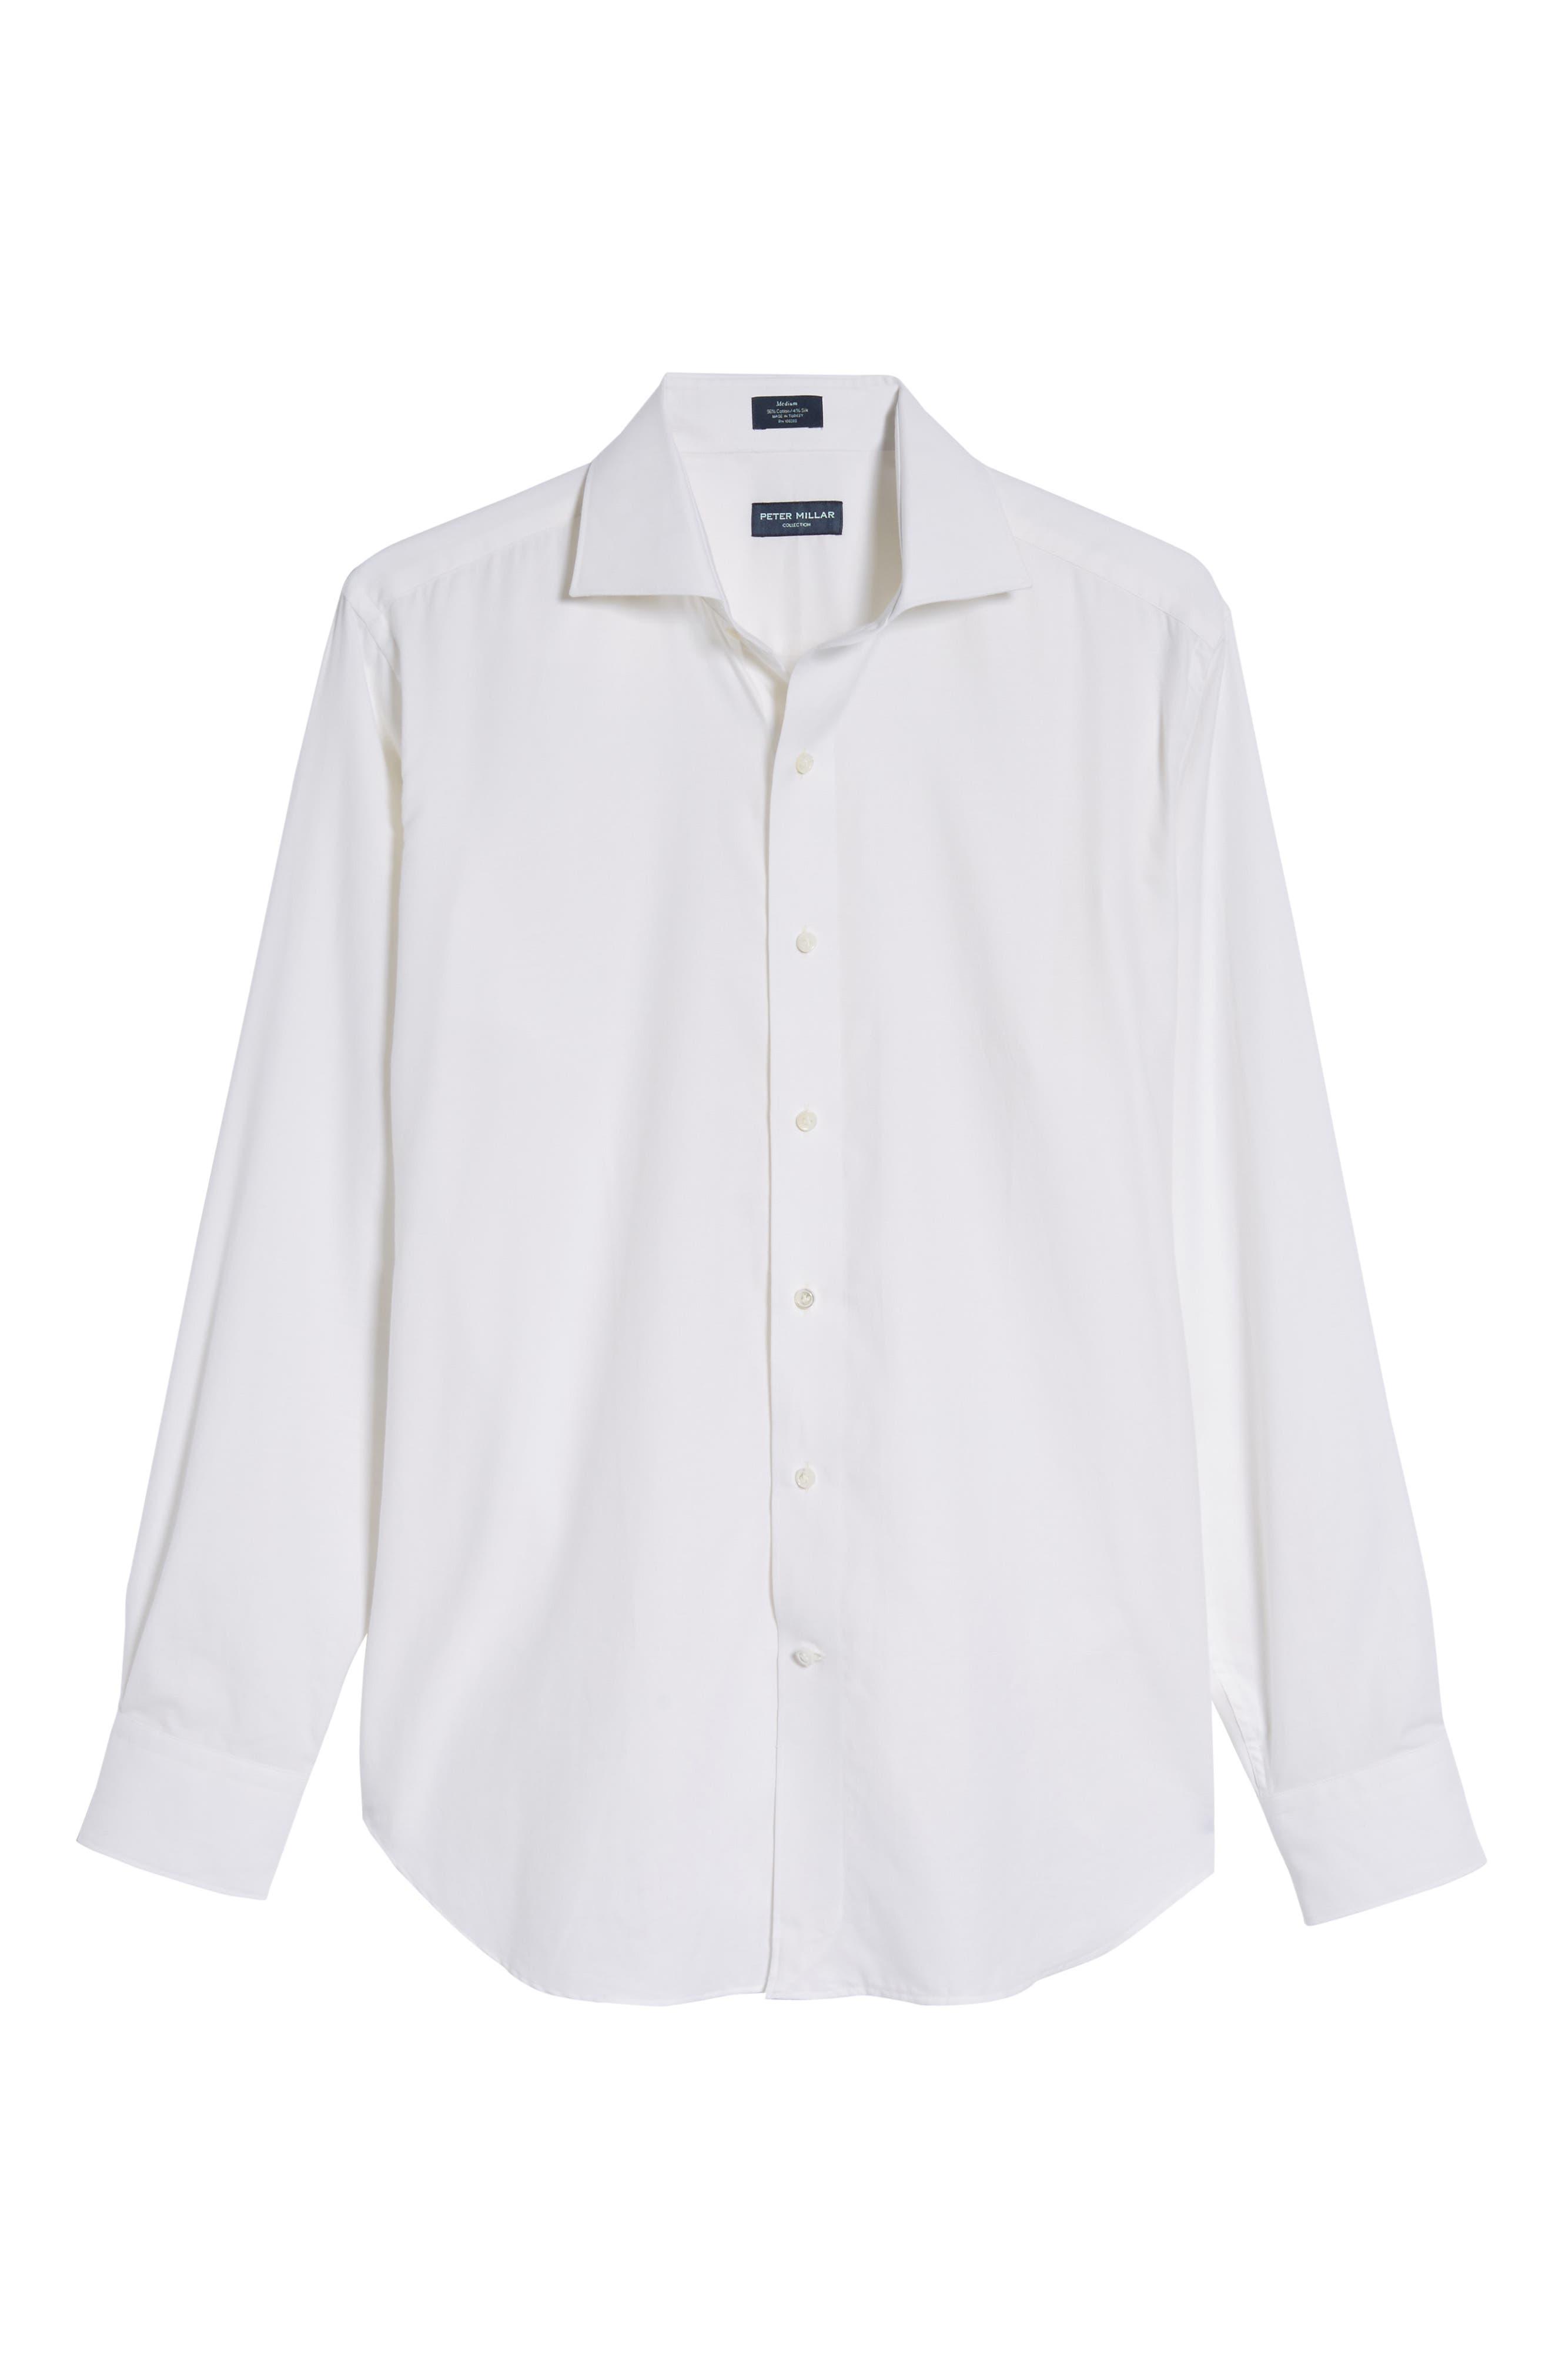 Silky Touch Herringbone Sport Shirt,                             Alternate thumbnail 6, color,                             100